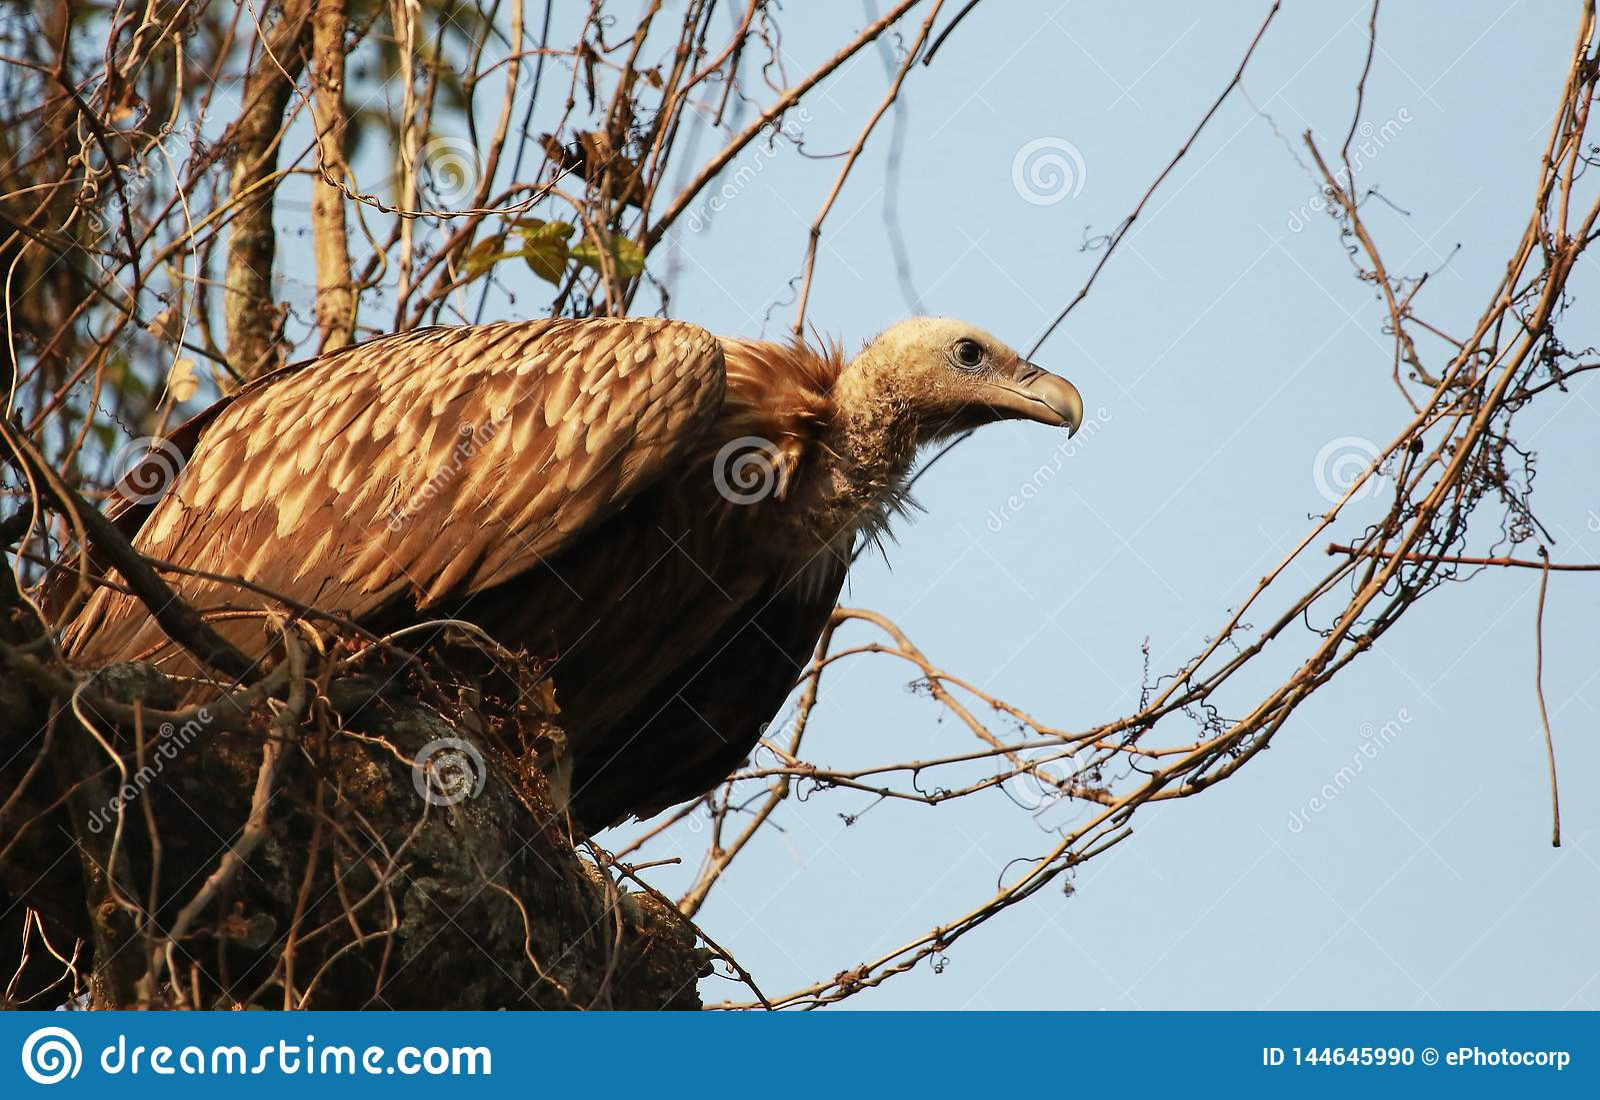 Long billed vulture, Gyps tenuirostris, Kaziranga, National park, Assam, India